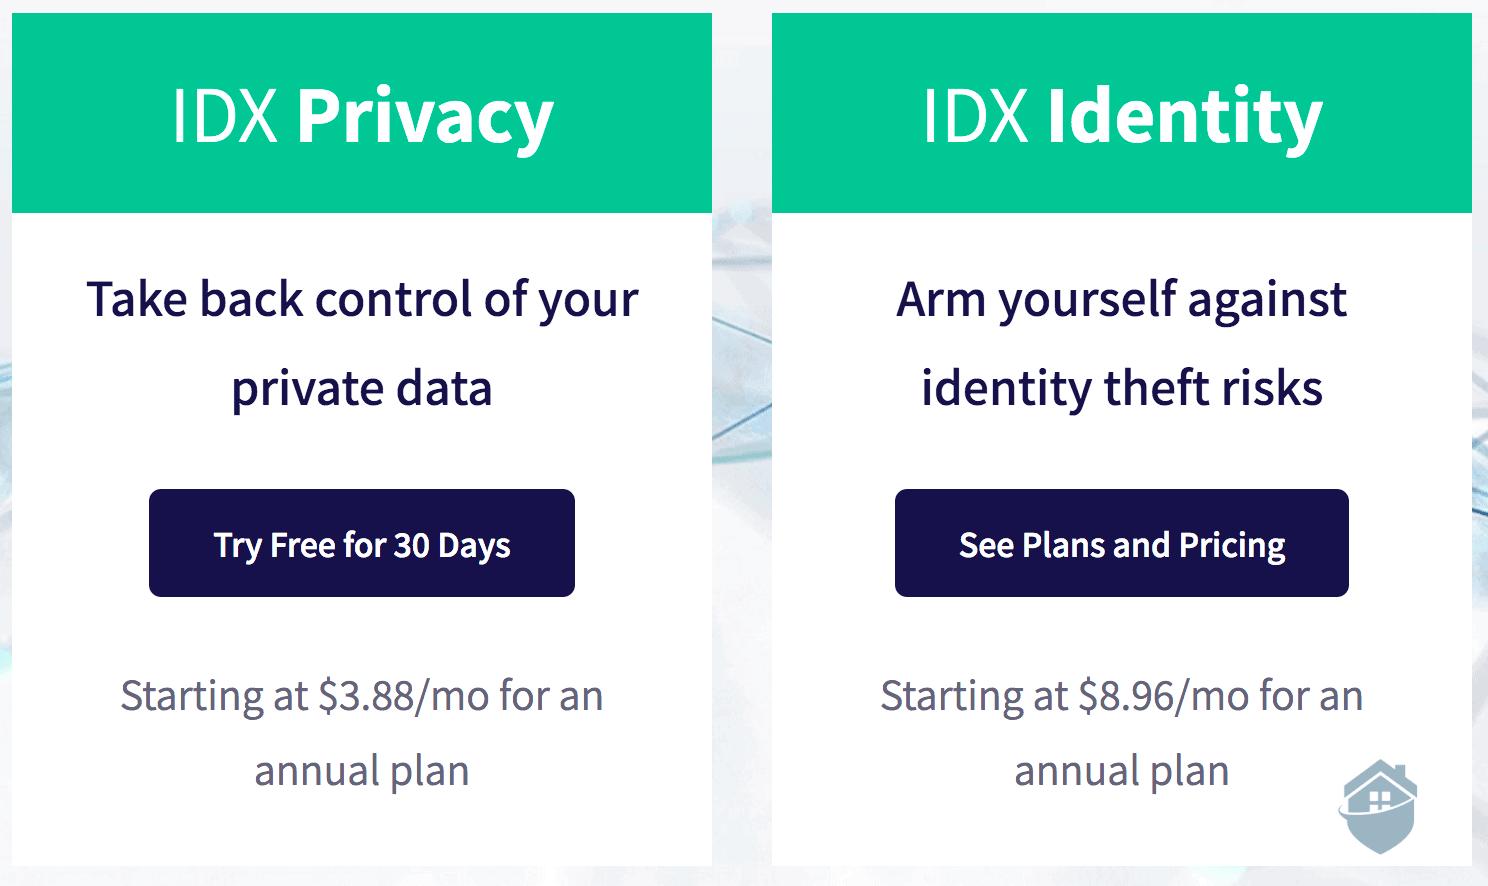 IDX Plans